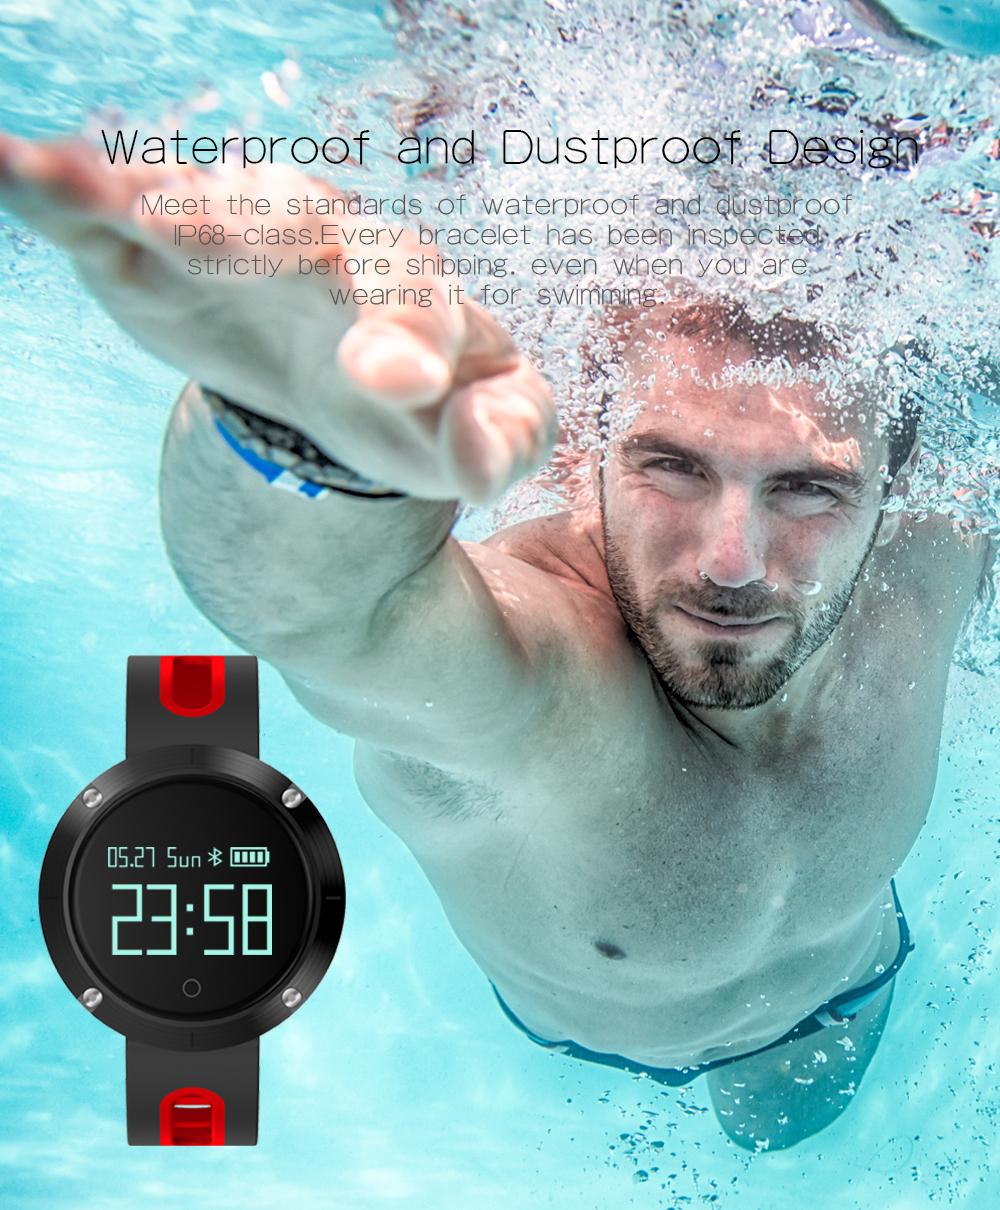 Smart band DM58 Waterproof Smart Wristband Heart rate monitor Blood Pressure Watch Smart bracelet Fitness Tracker PK mi band 2 8